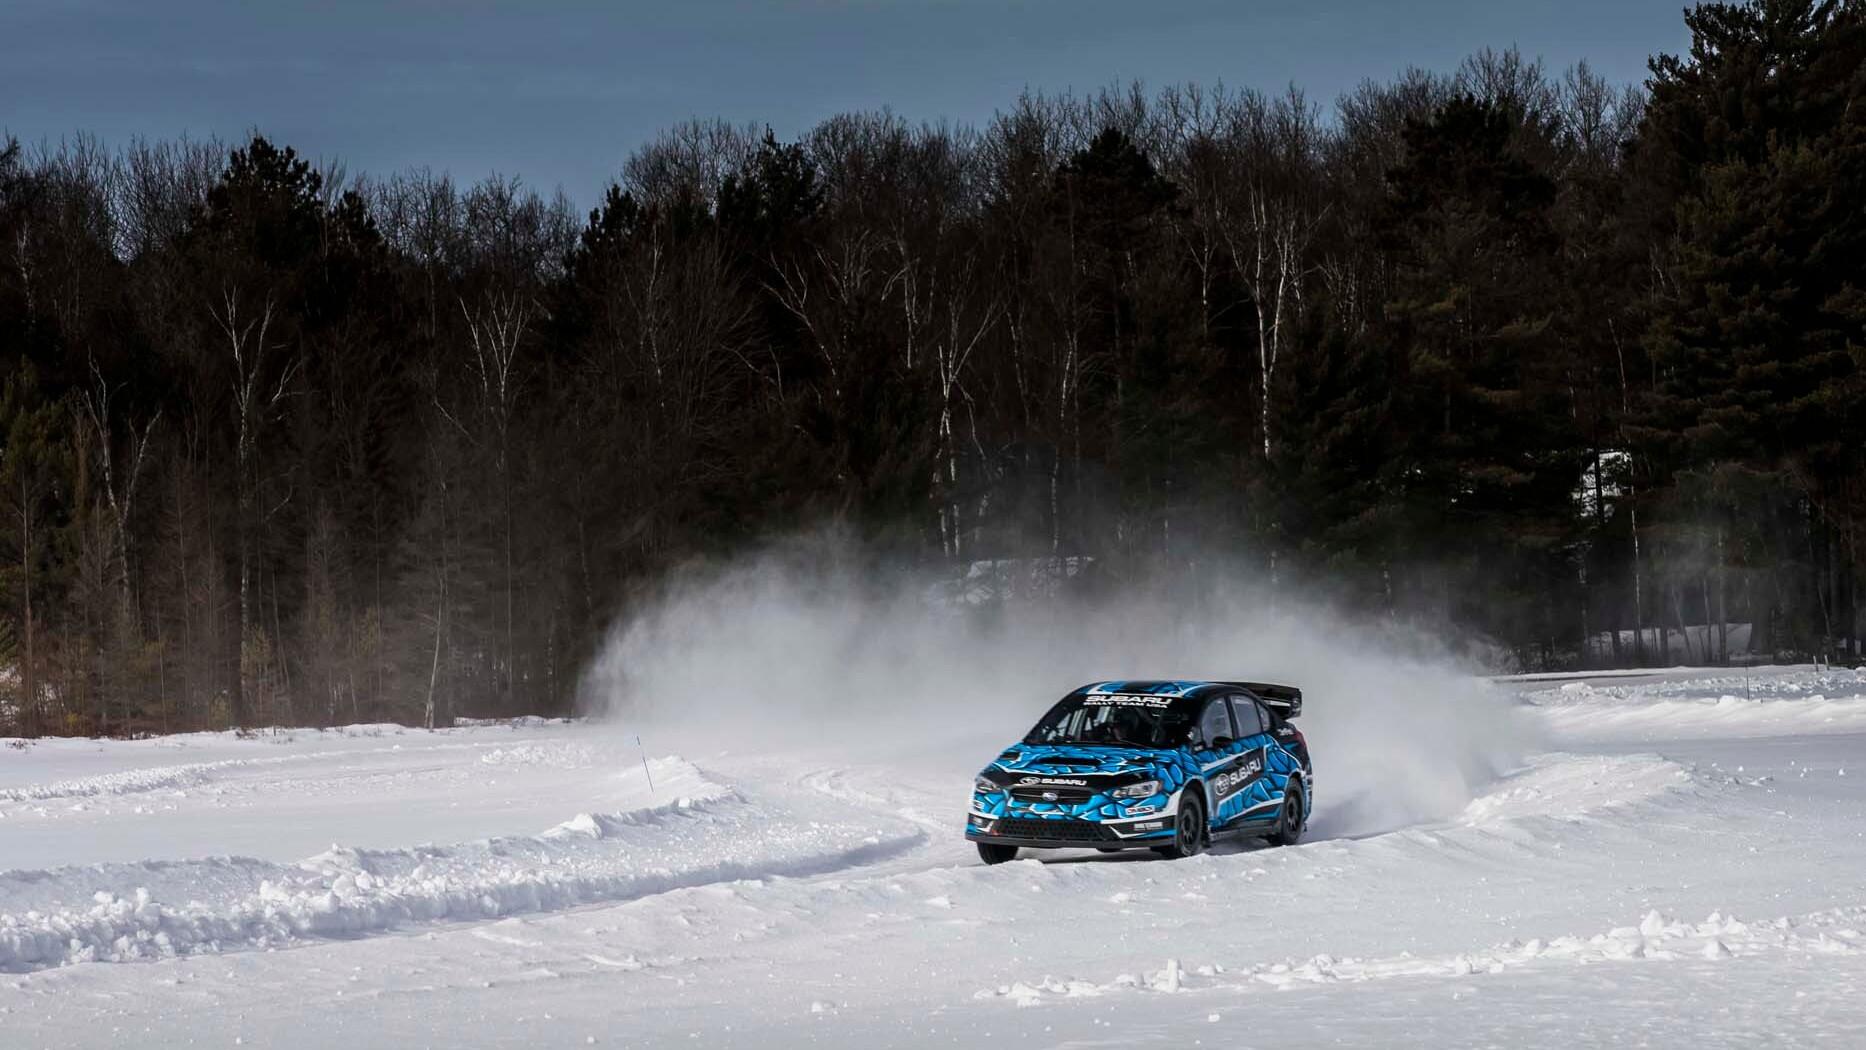 Subaru WRX rallycross race car